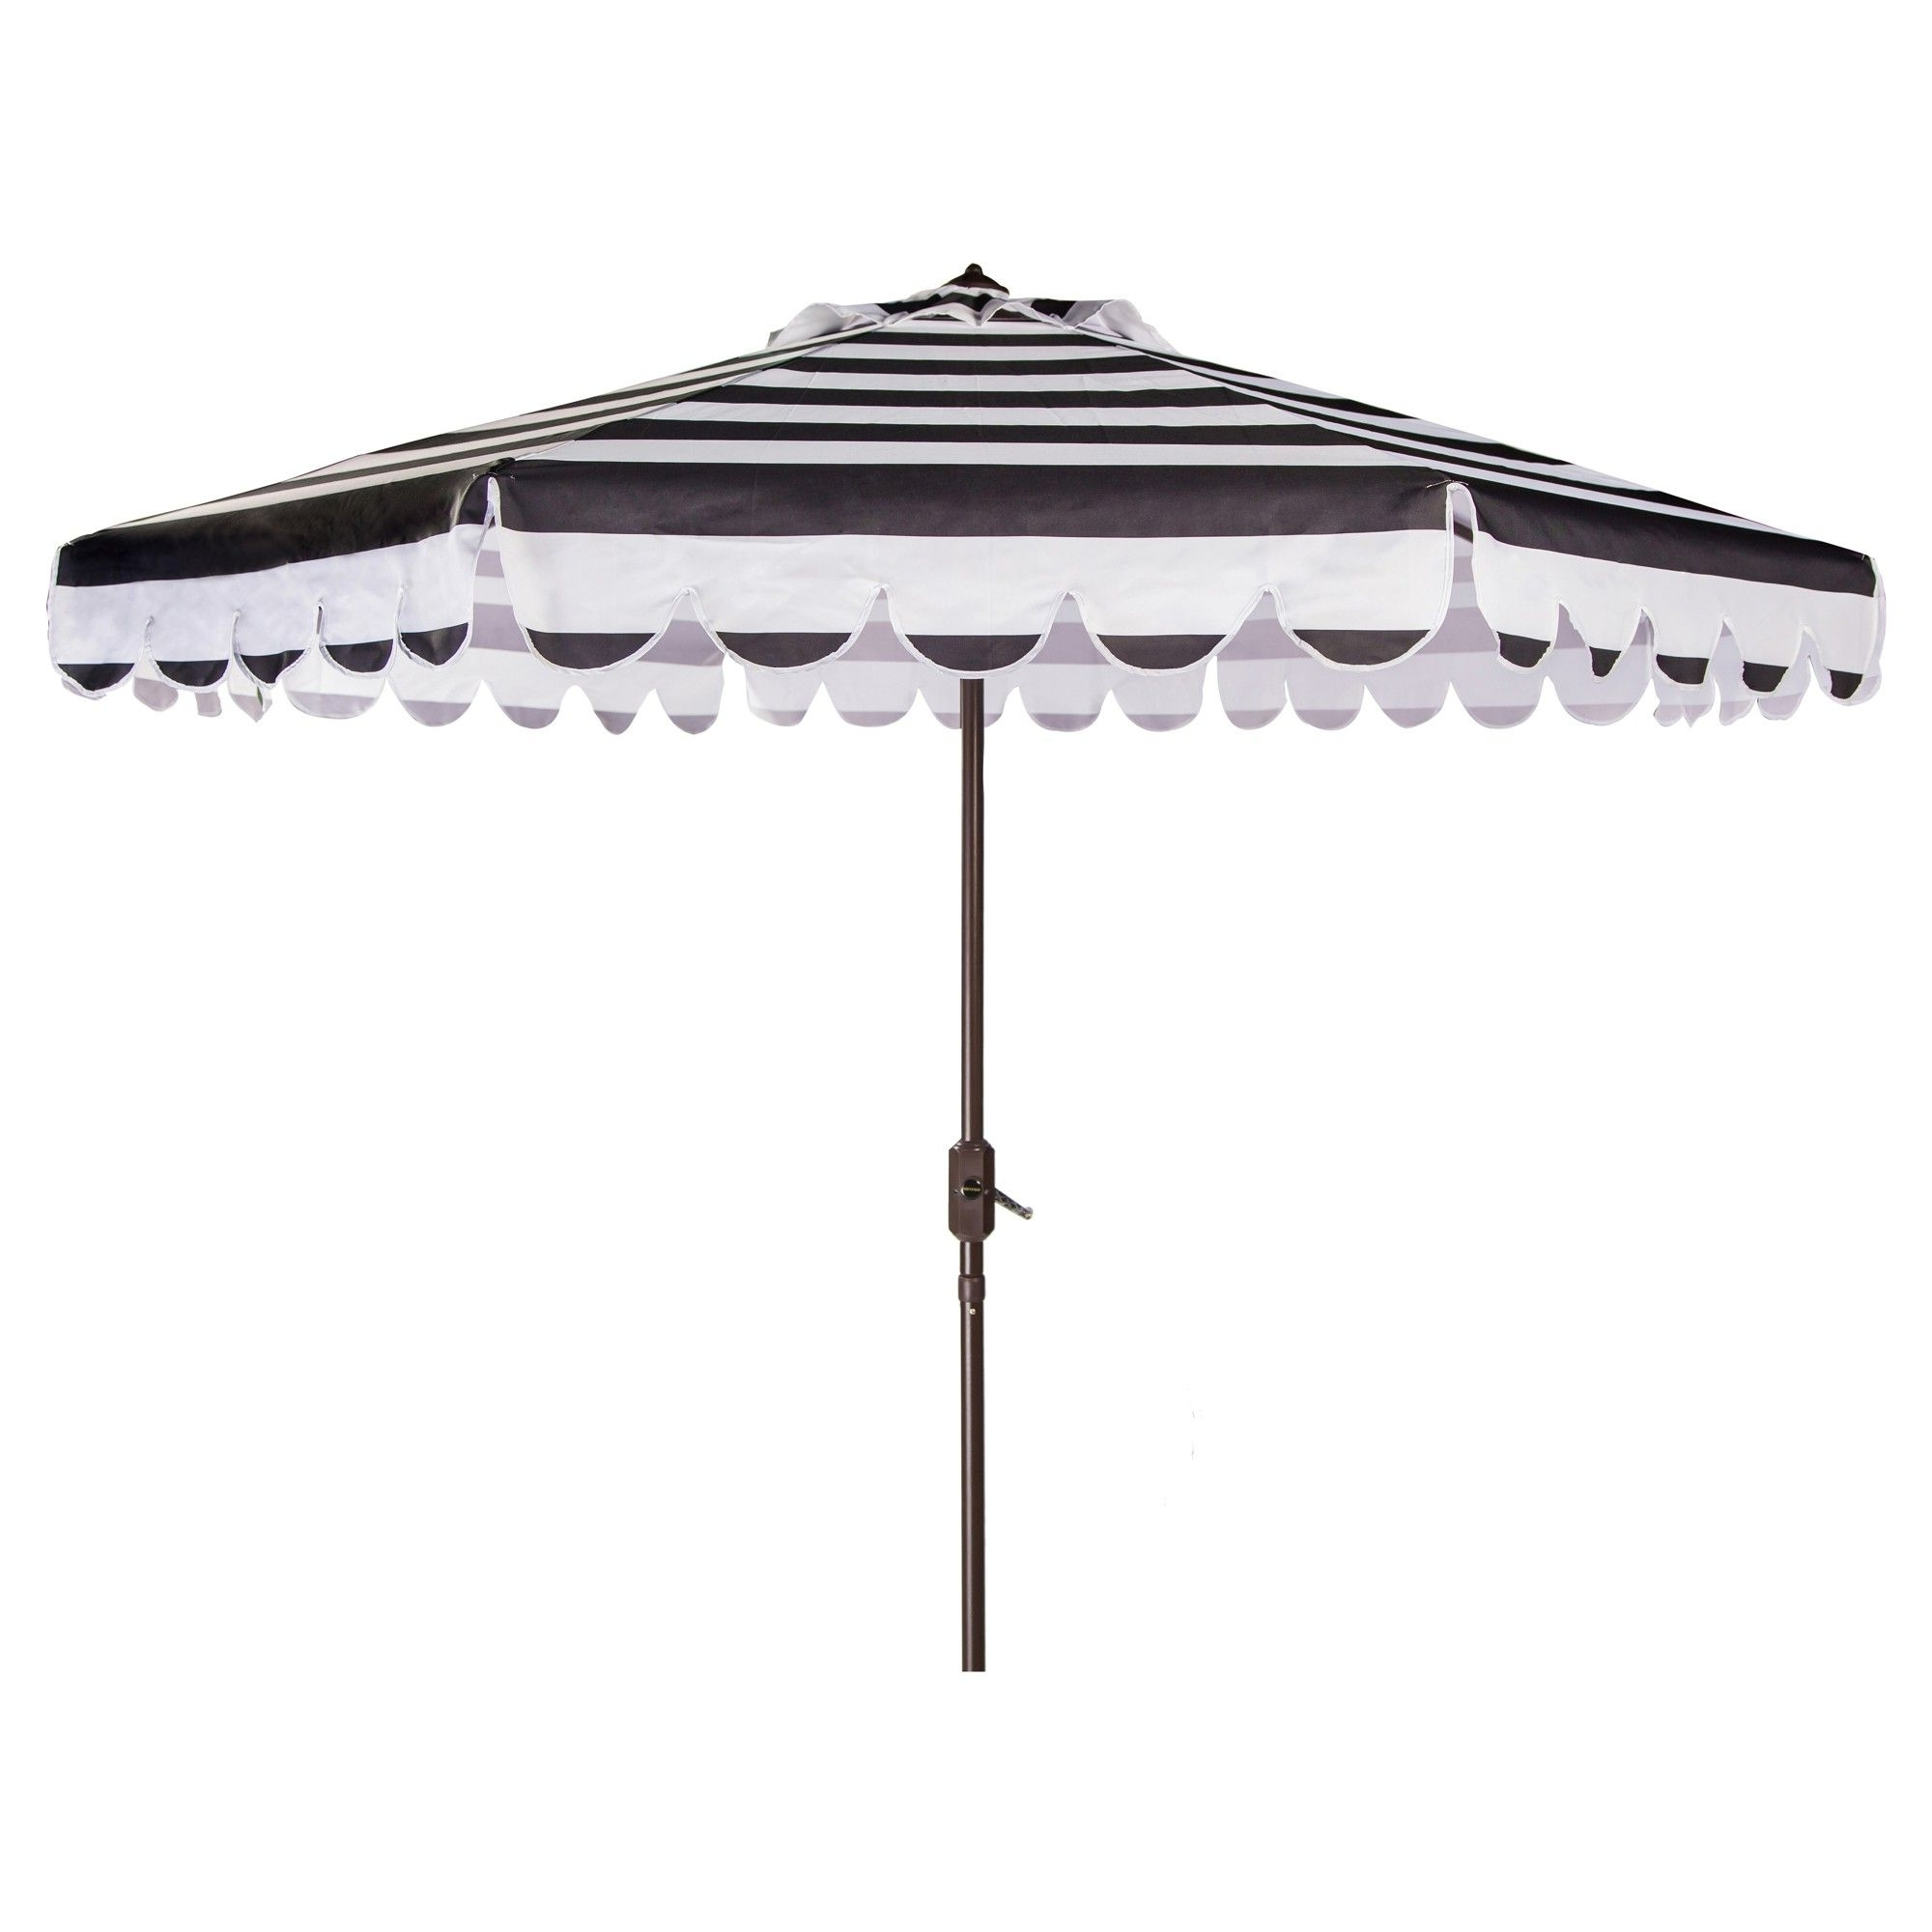 Well Known Black And White Striped Patio Umbrellas Within Maui Single Scallop Striped 9' Crank Auto Tilt Umbrella – Black (View 3 of 20)